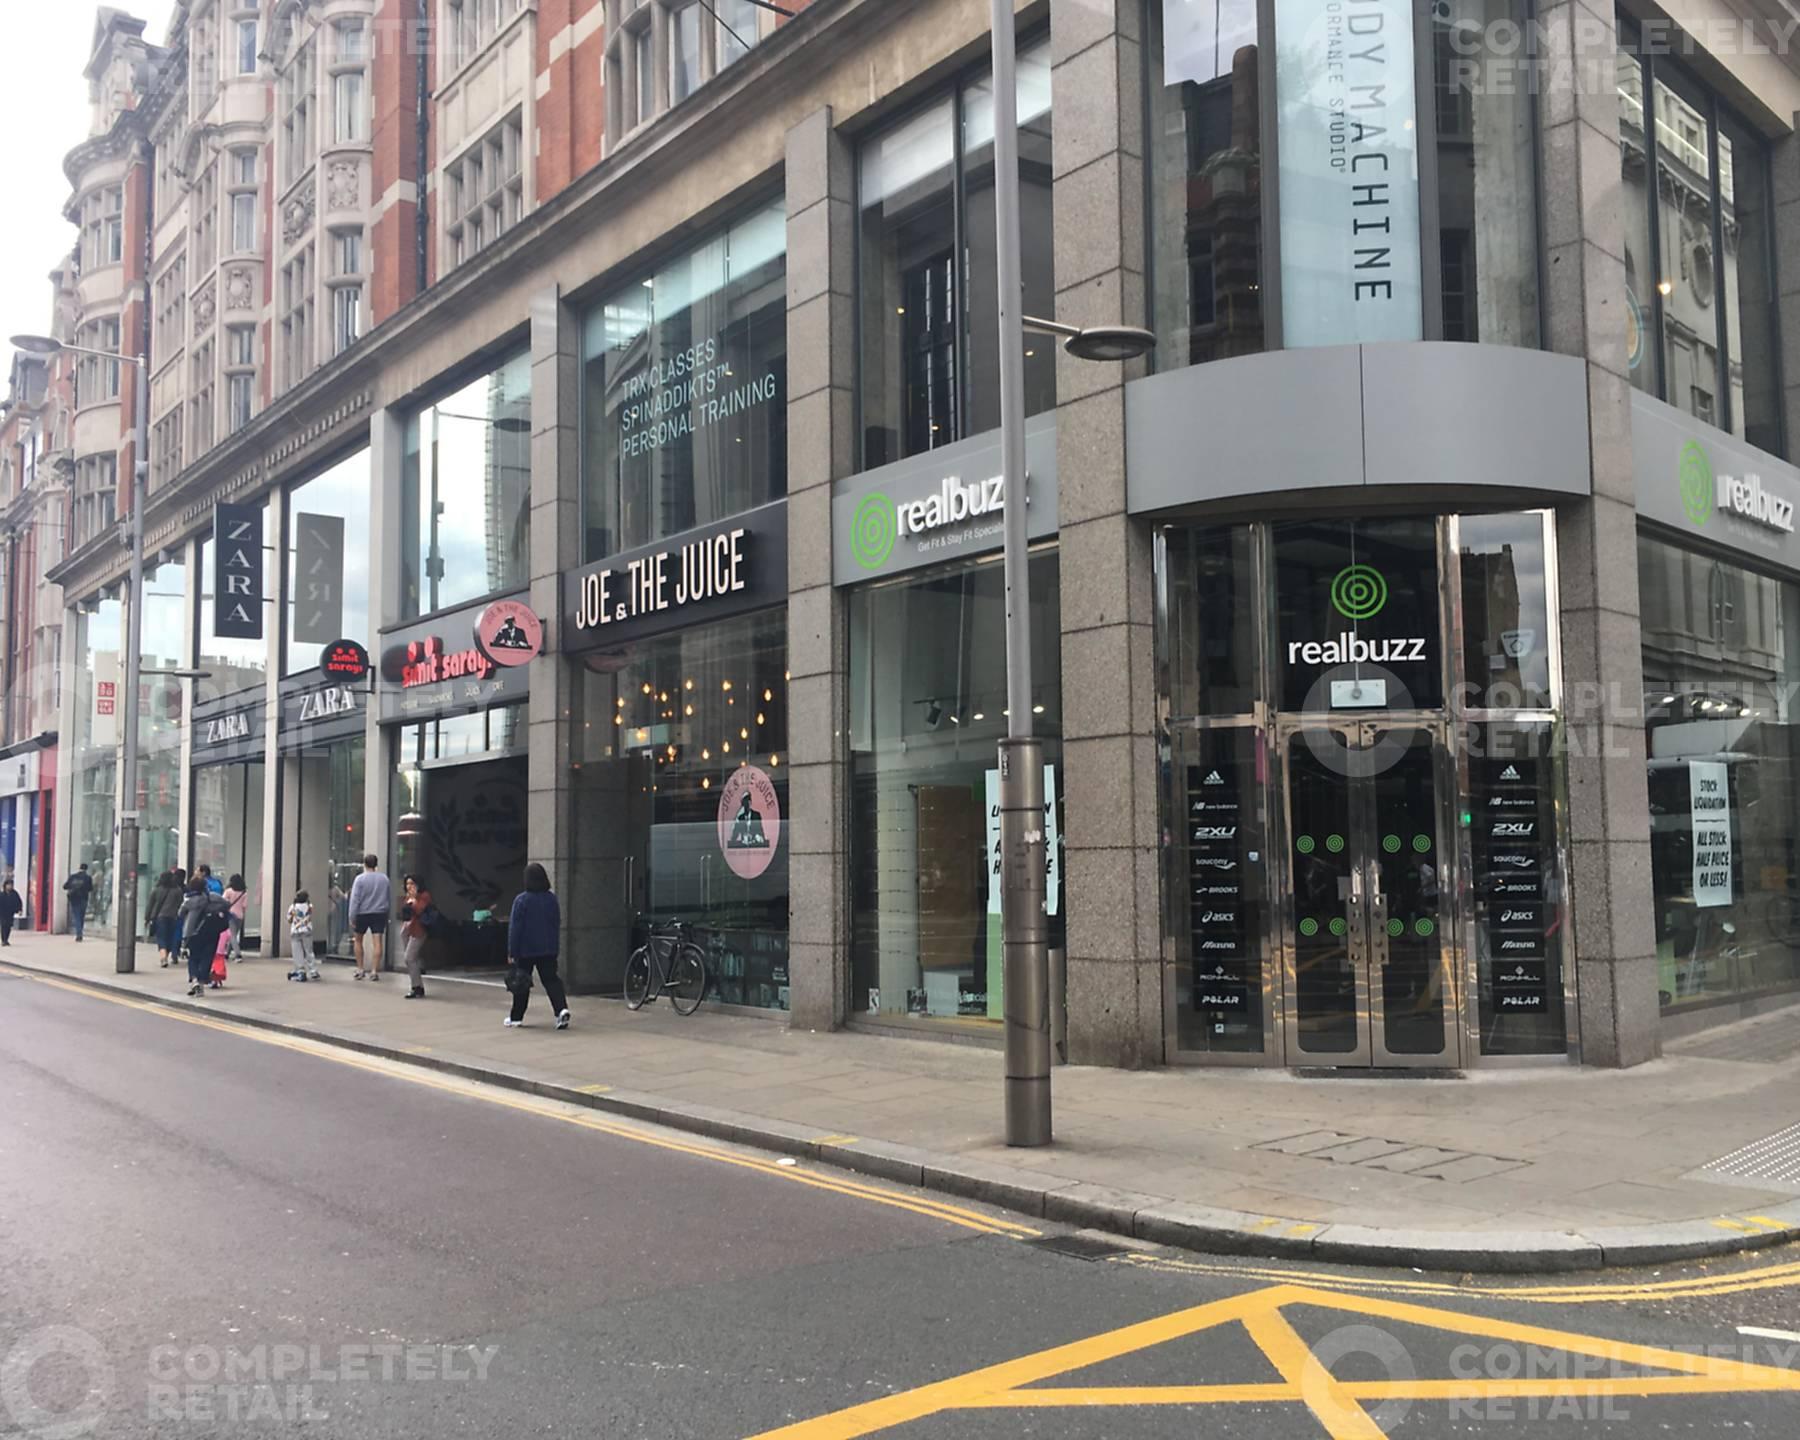 42 Kensington High Street, London W8